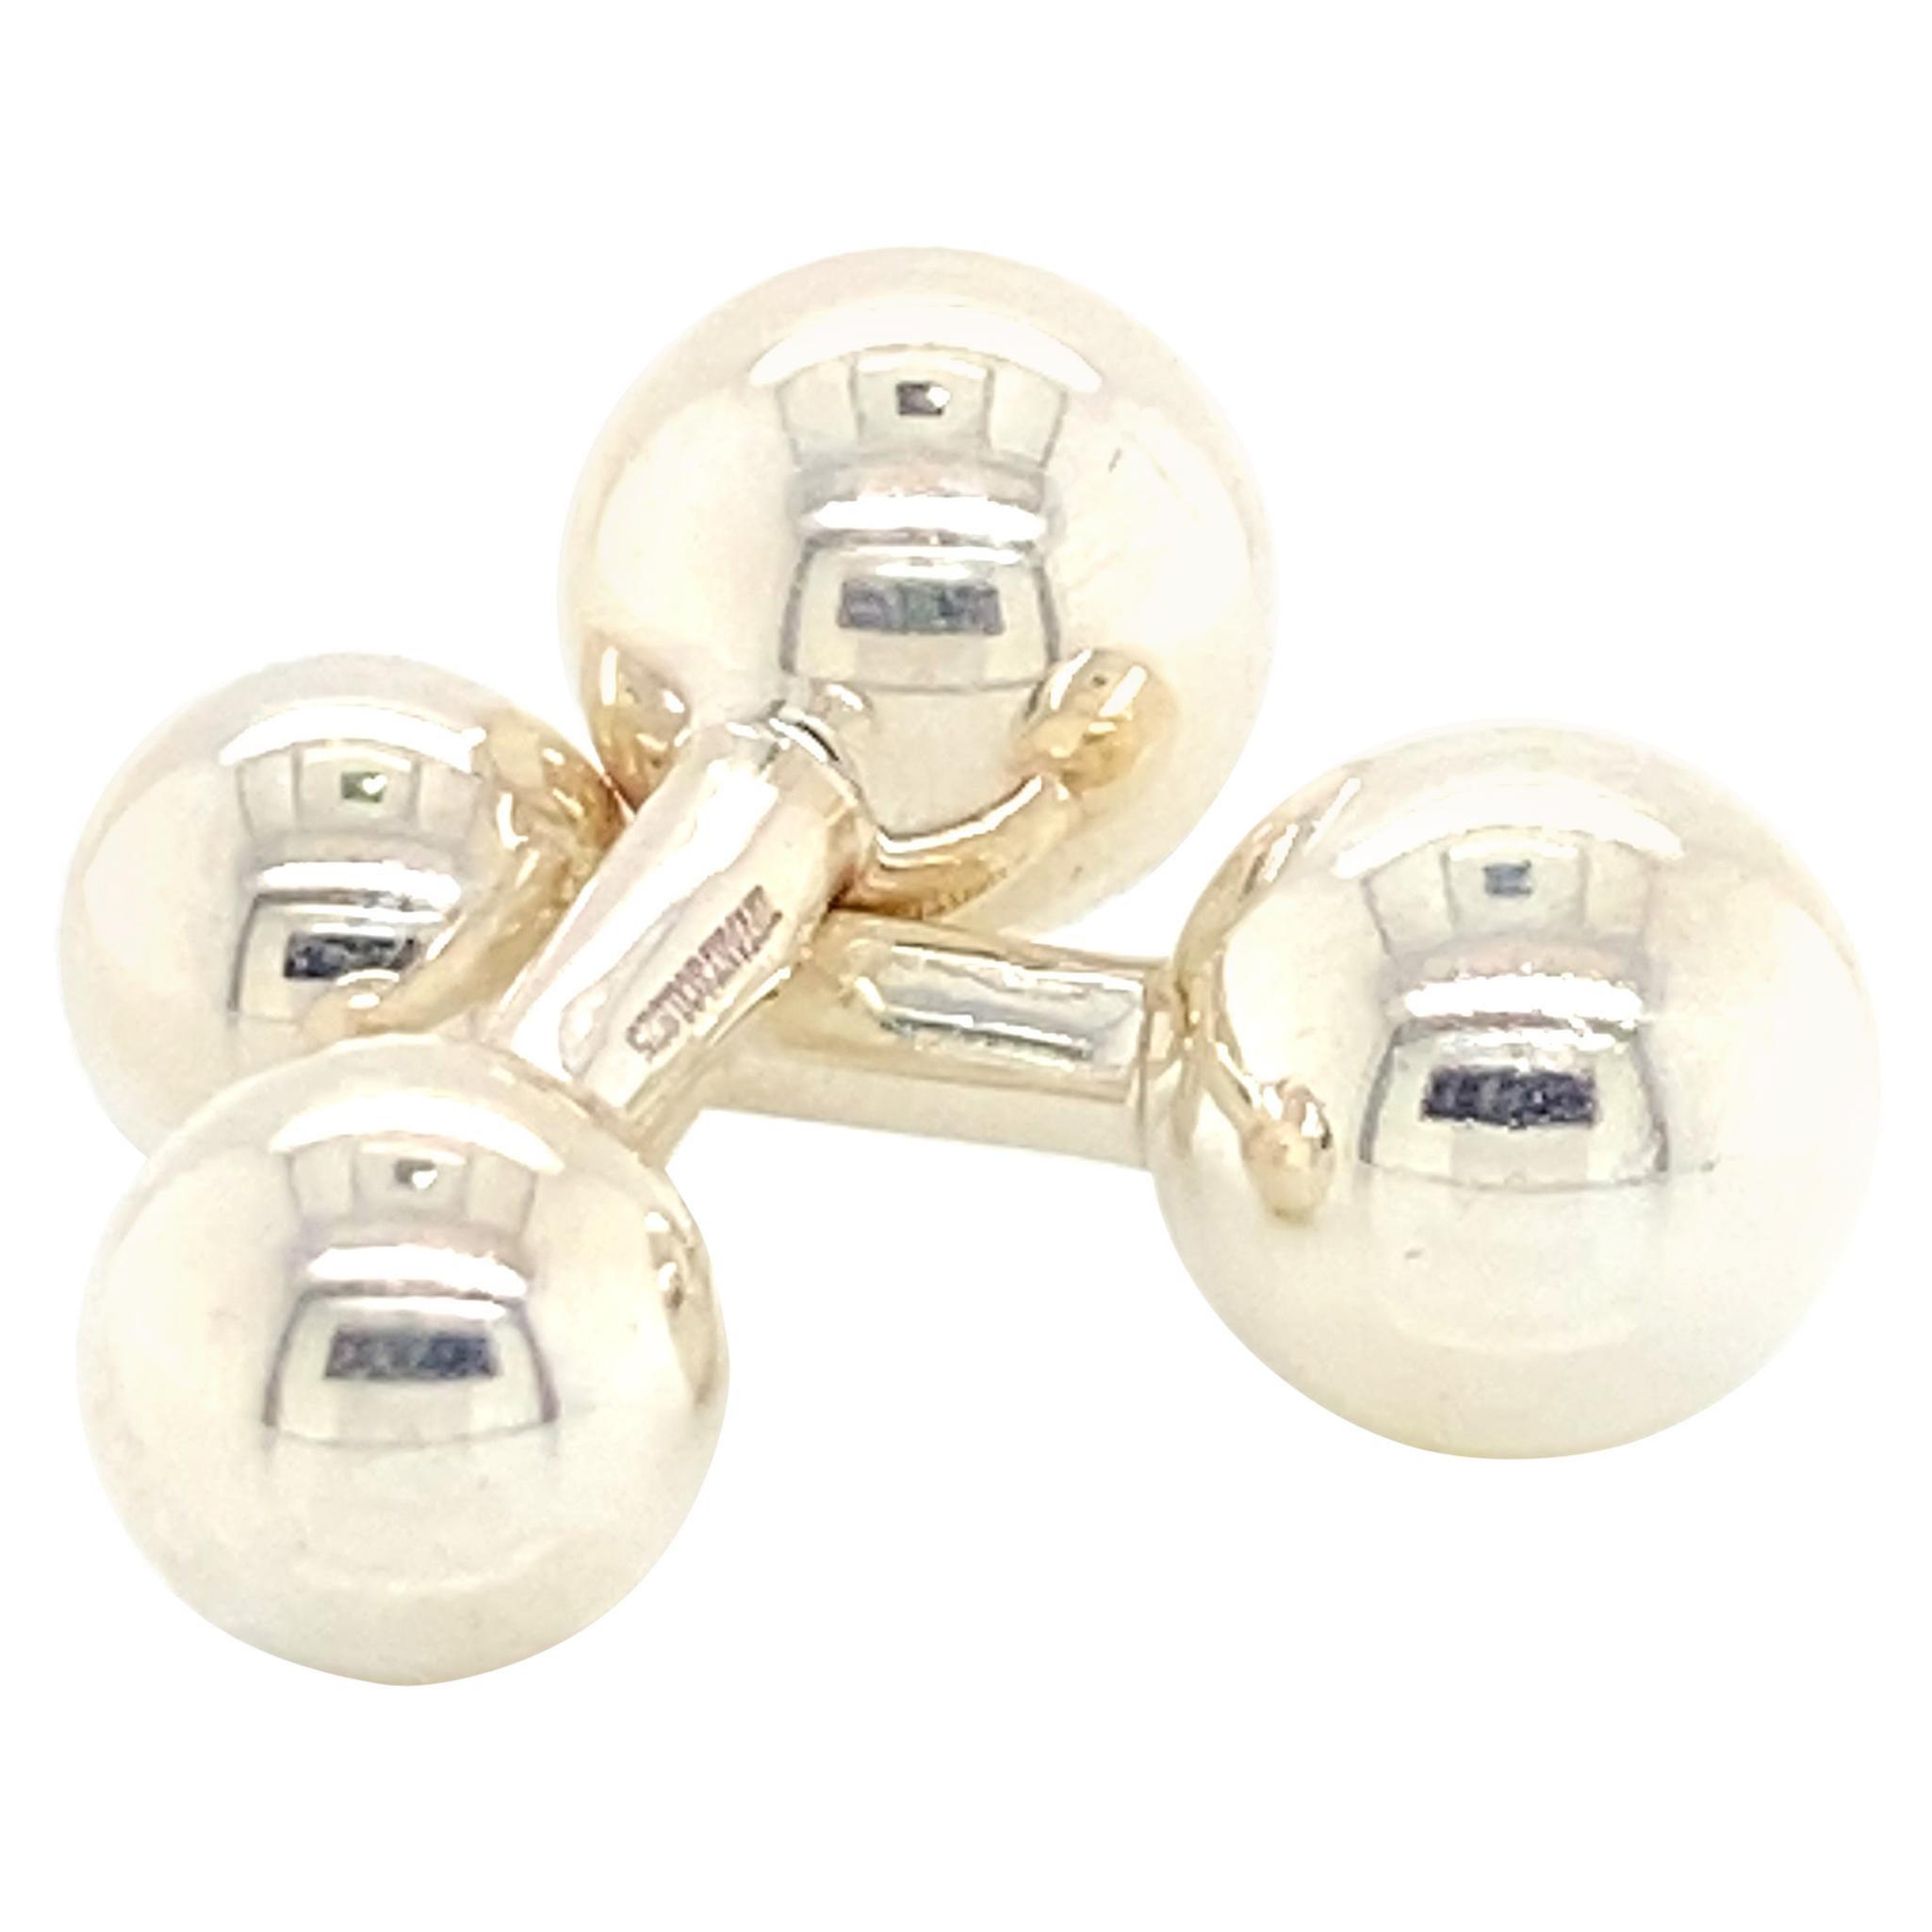 Tiffany & Co. Estate Barbell Cufflinks Sterling Silver 8.72 Grams